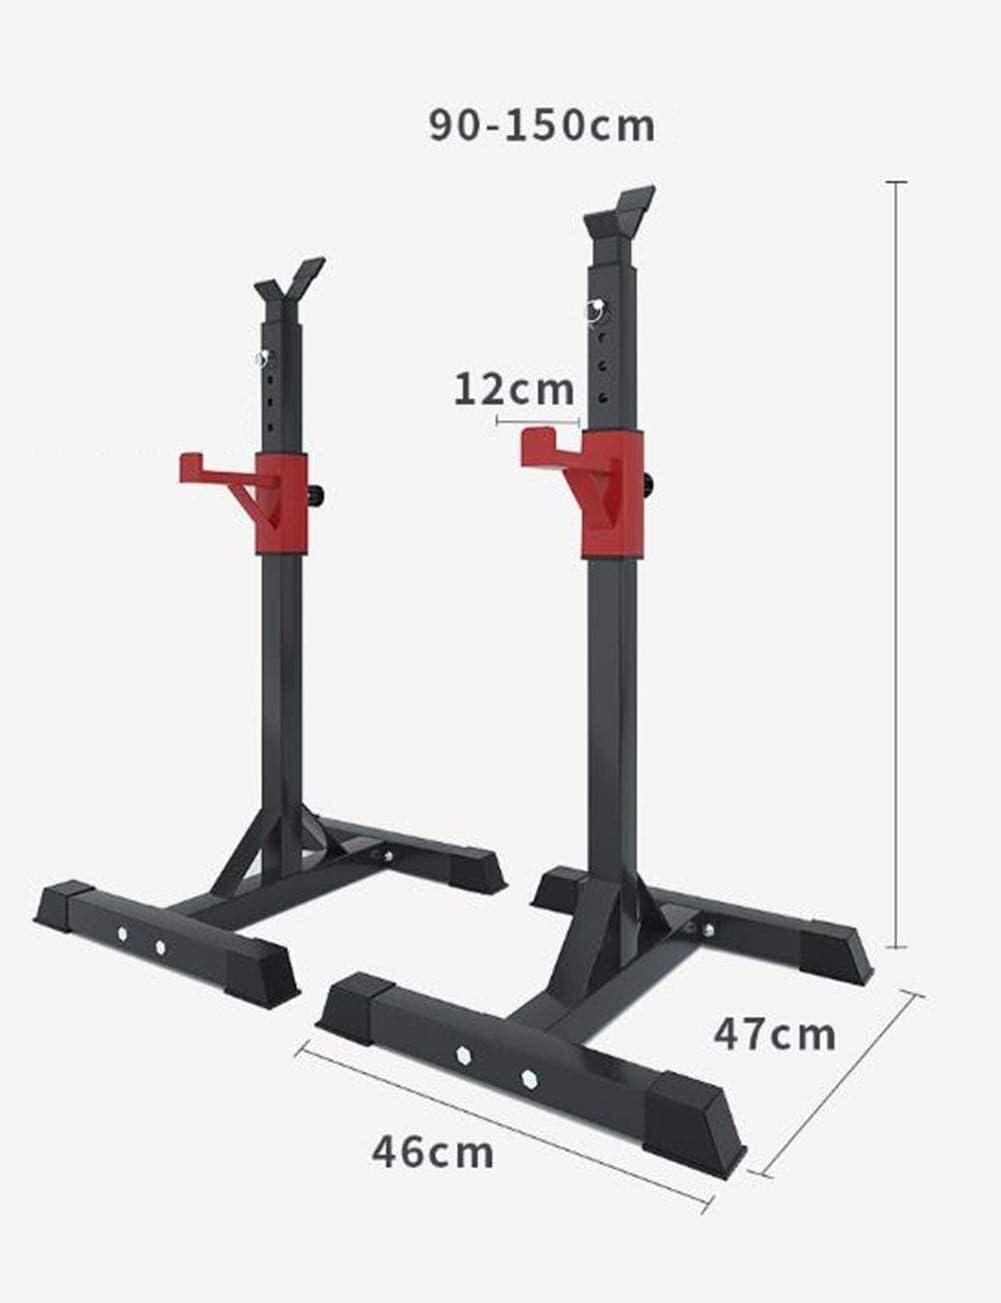 Height Adjustable Fitness Equipment Home Gym IndoorSiamese Adjustable Squat Rack Squat Rack Barbell Rack Load 260kg Squat Stands Rack Weight Rack Gym Rack Squat And Bench Press Rack Dumbbell Stand